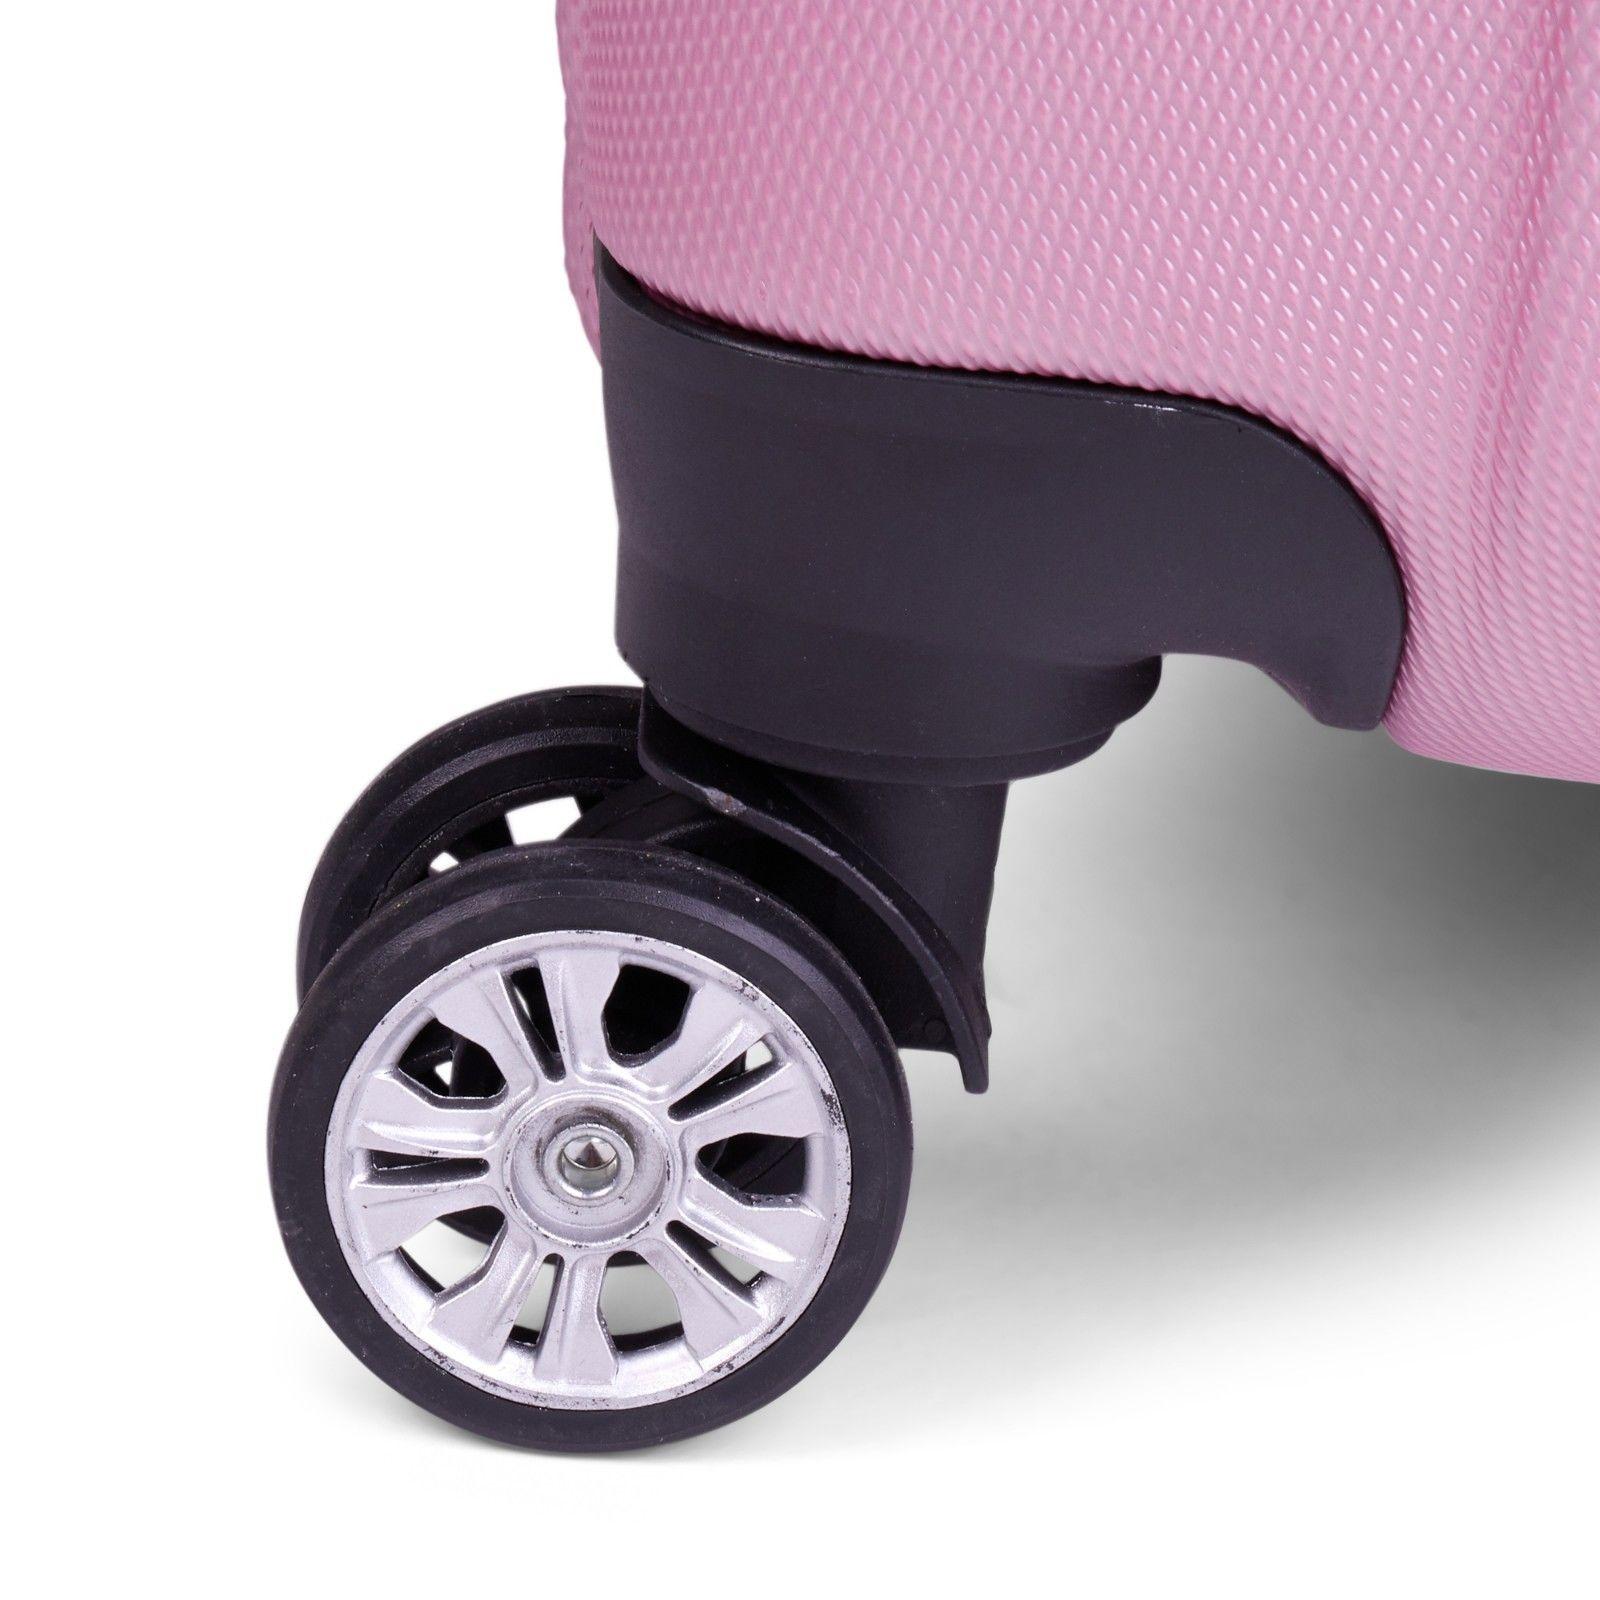 Milano-Premium-3pc-ABS-Luggage-Suitcase-Luxury-Hard-Case-Shockproof-Travel-Set thumbnail 27